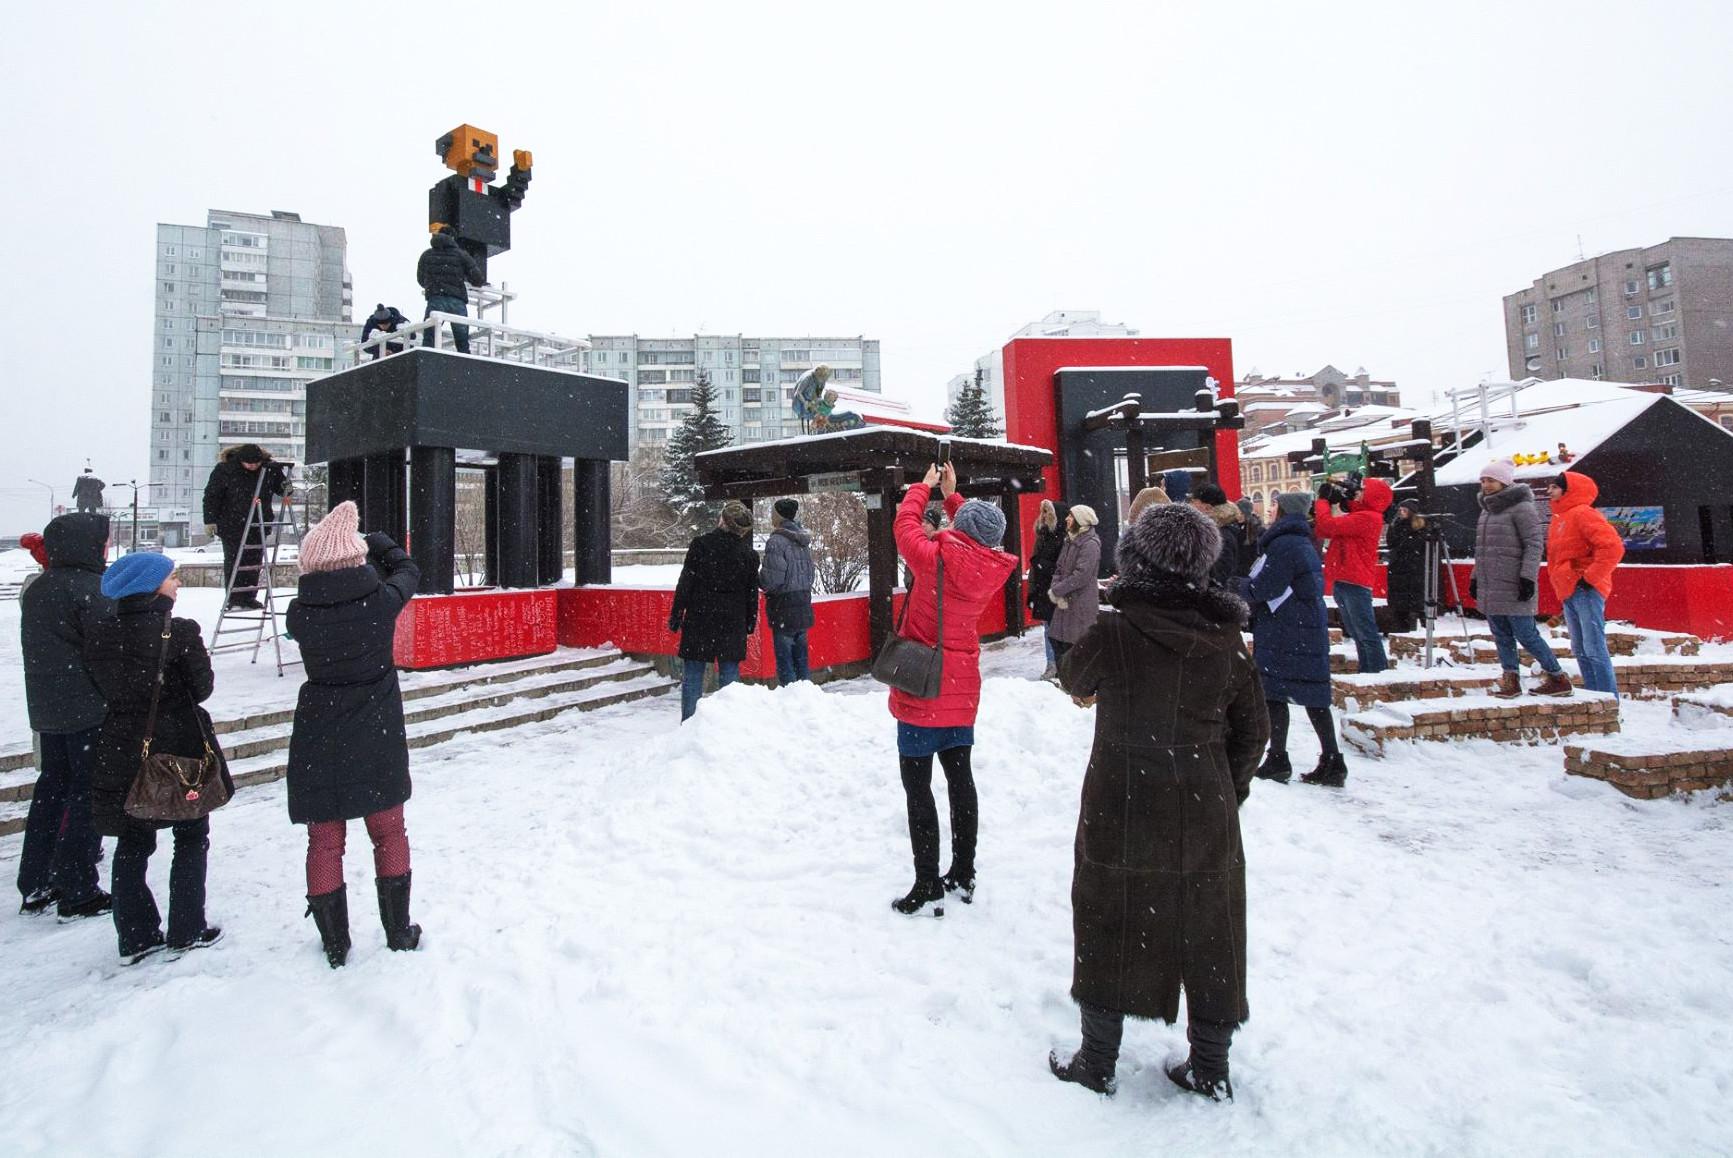 A statue of Vladimir Lenin in Krasnoyarsk